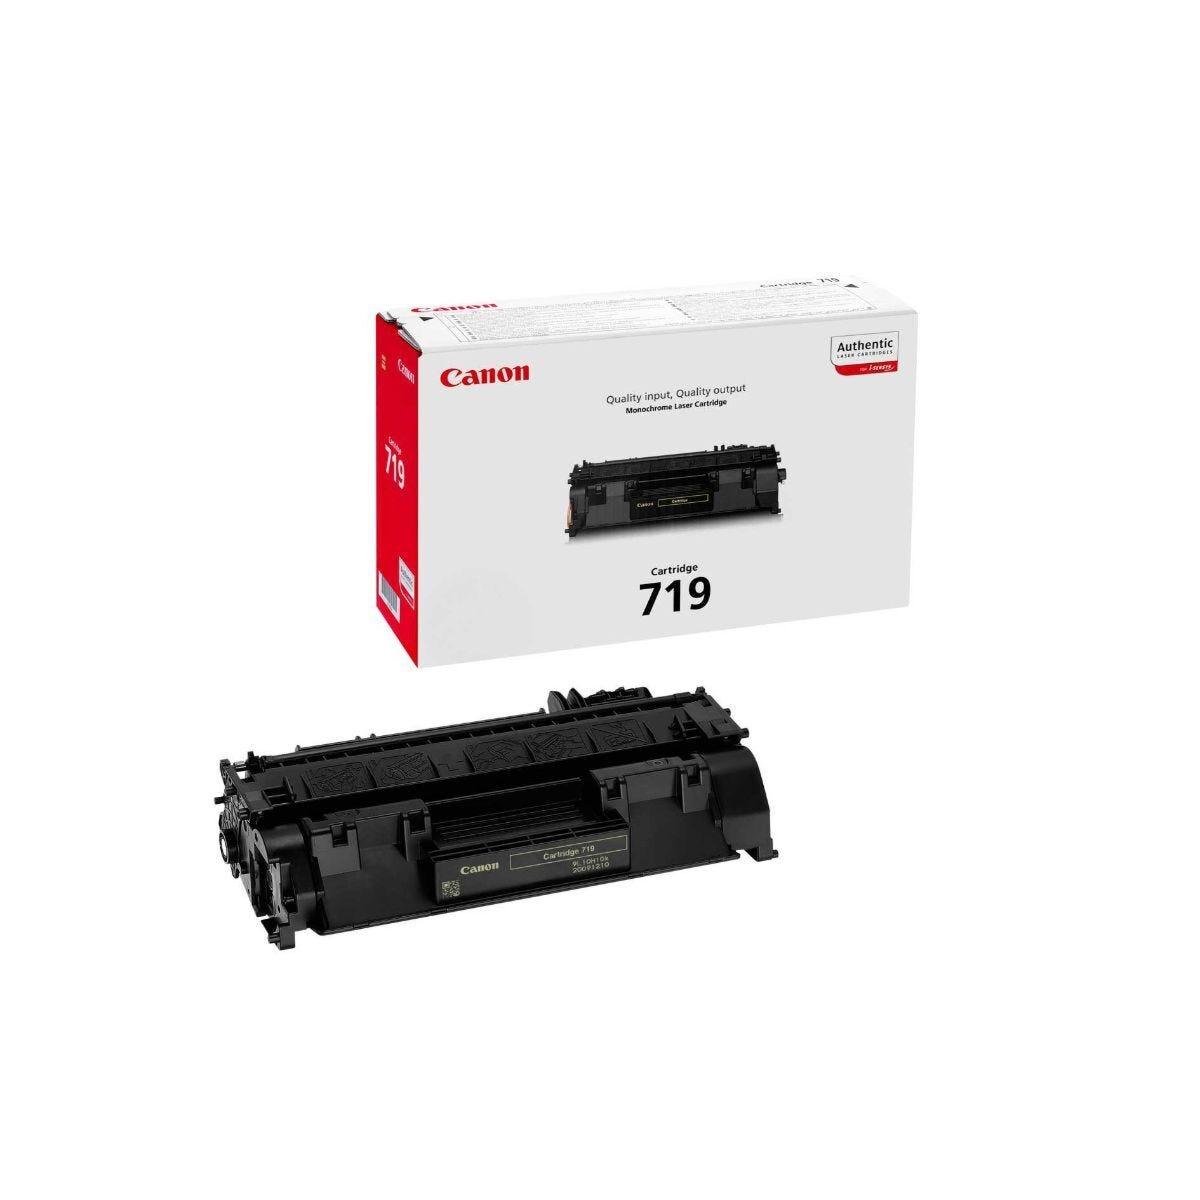 Canon 719 Printer Ink Toner Cartridge 3479B002AA